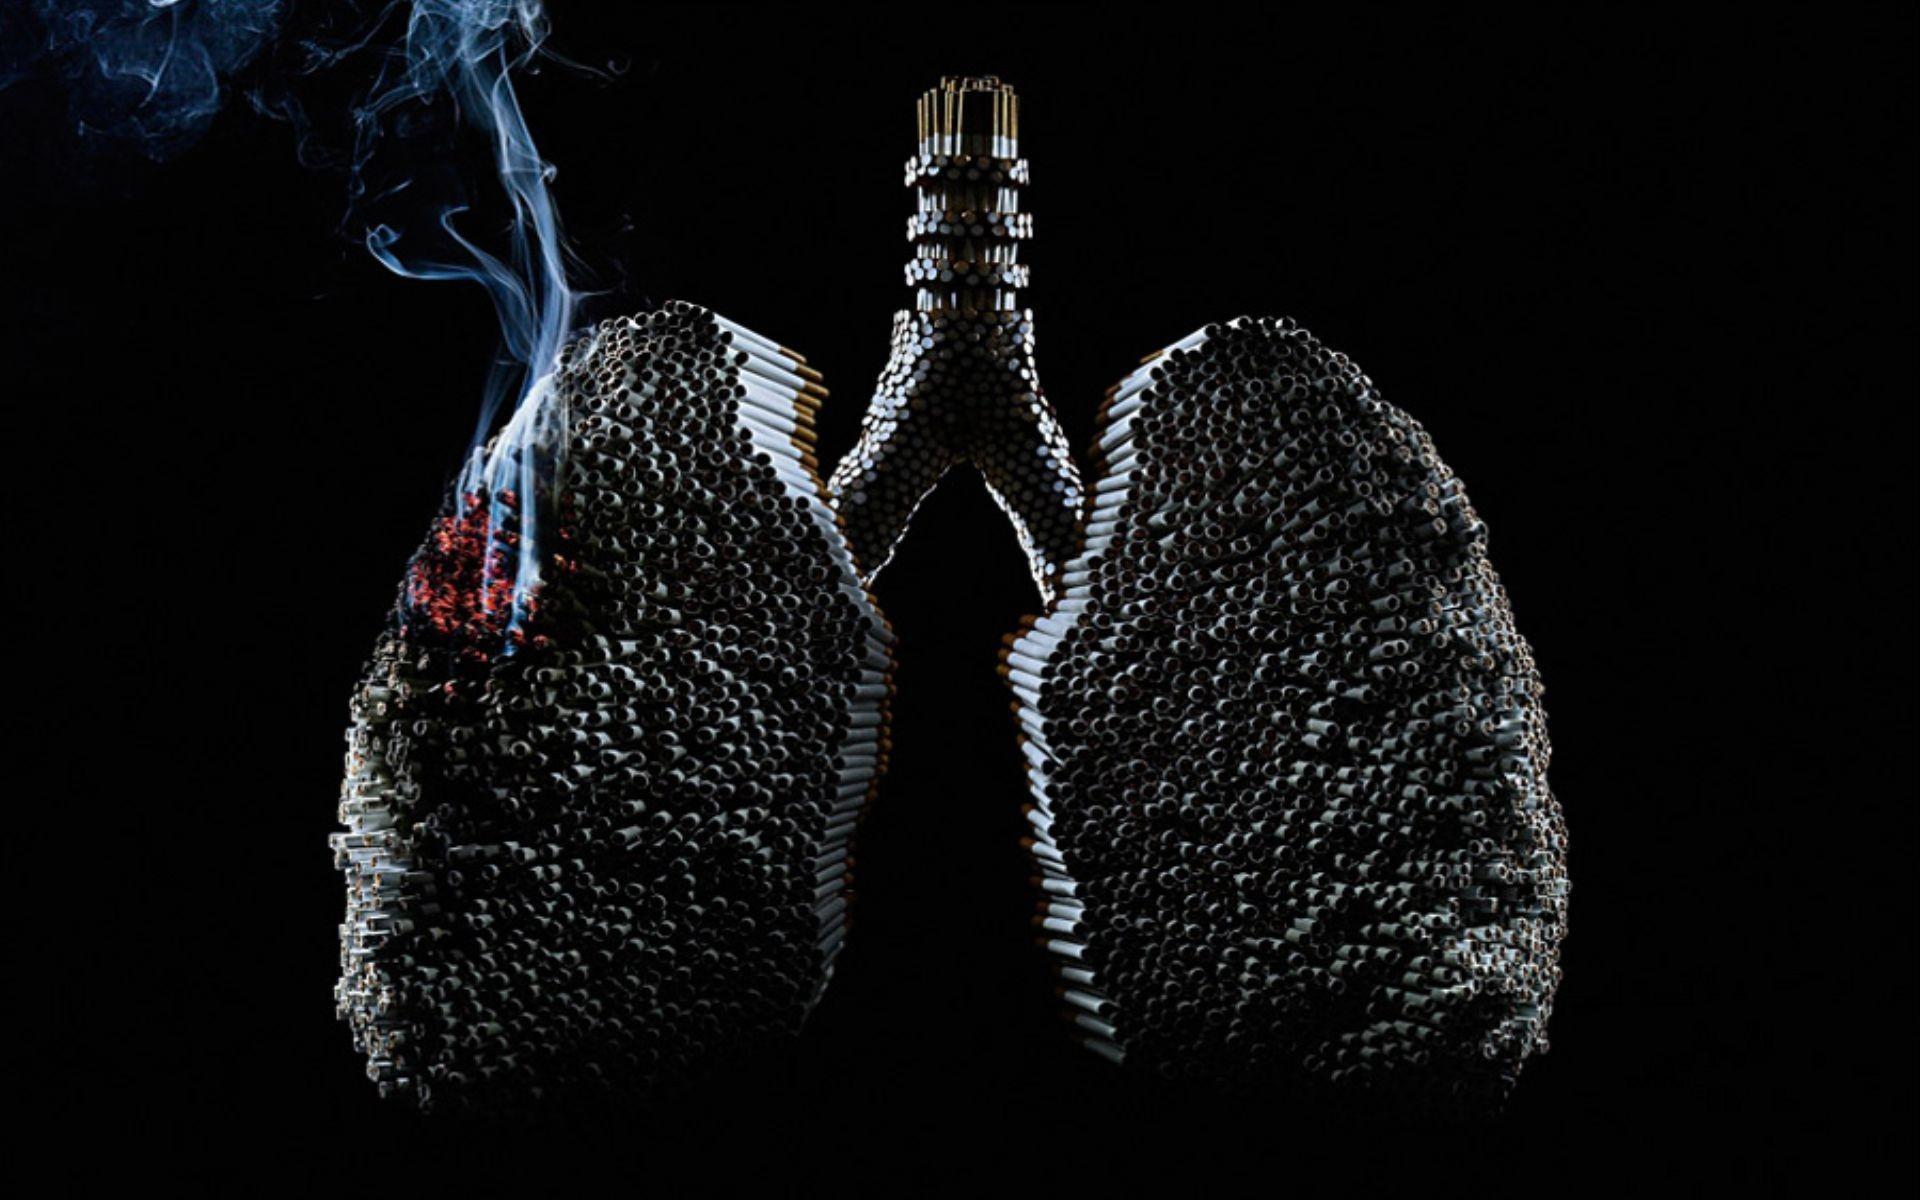 Lung Cancer Wallpaper